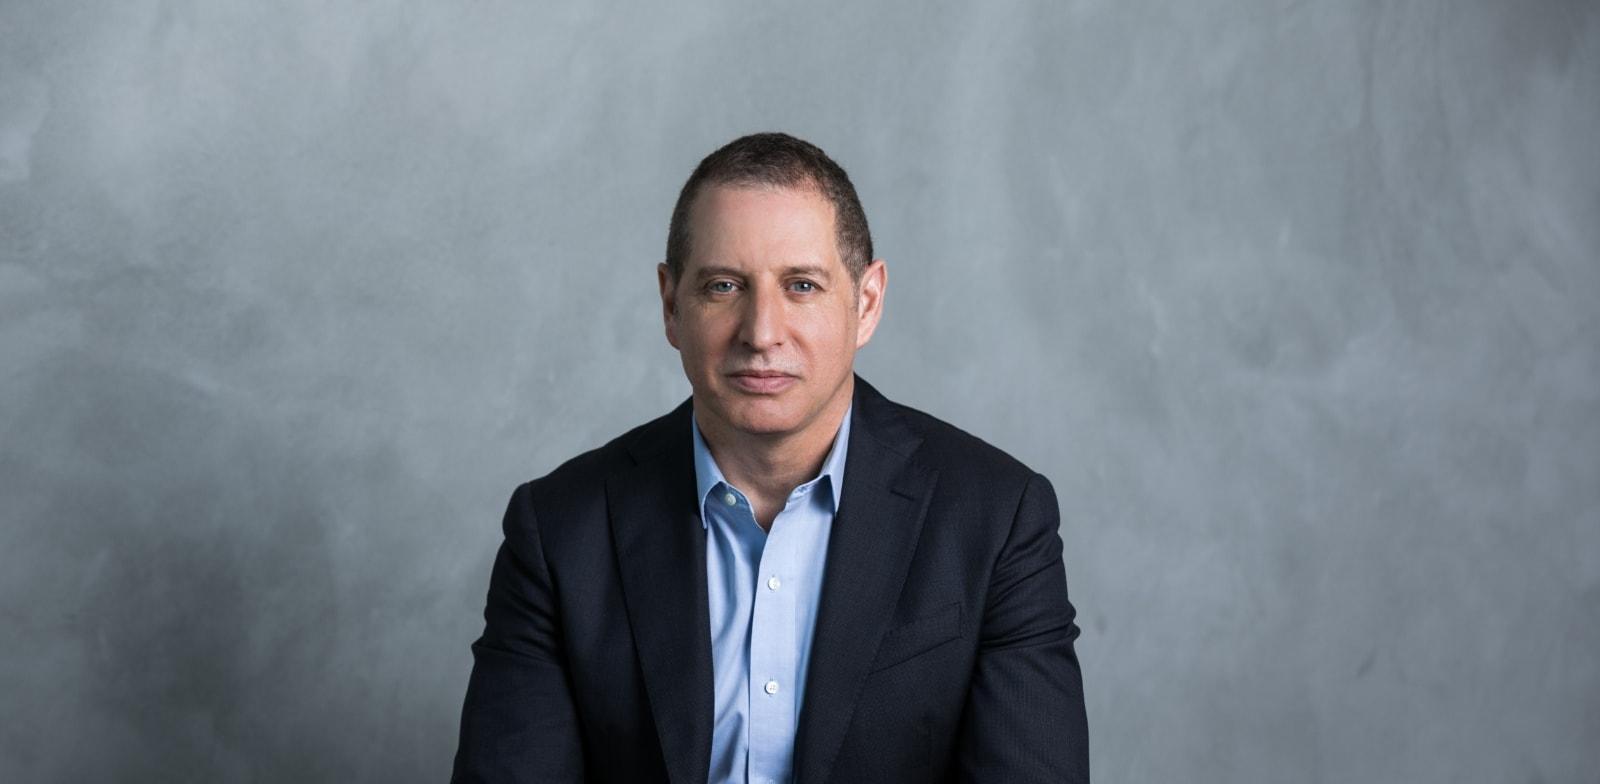 Amit Lederman Photo: AYR law firm website